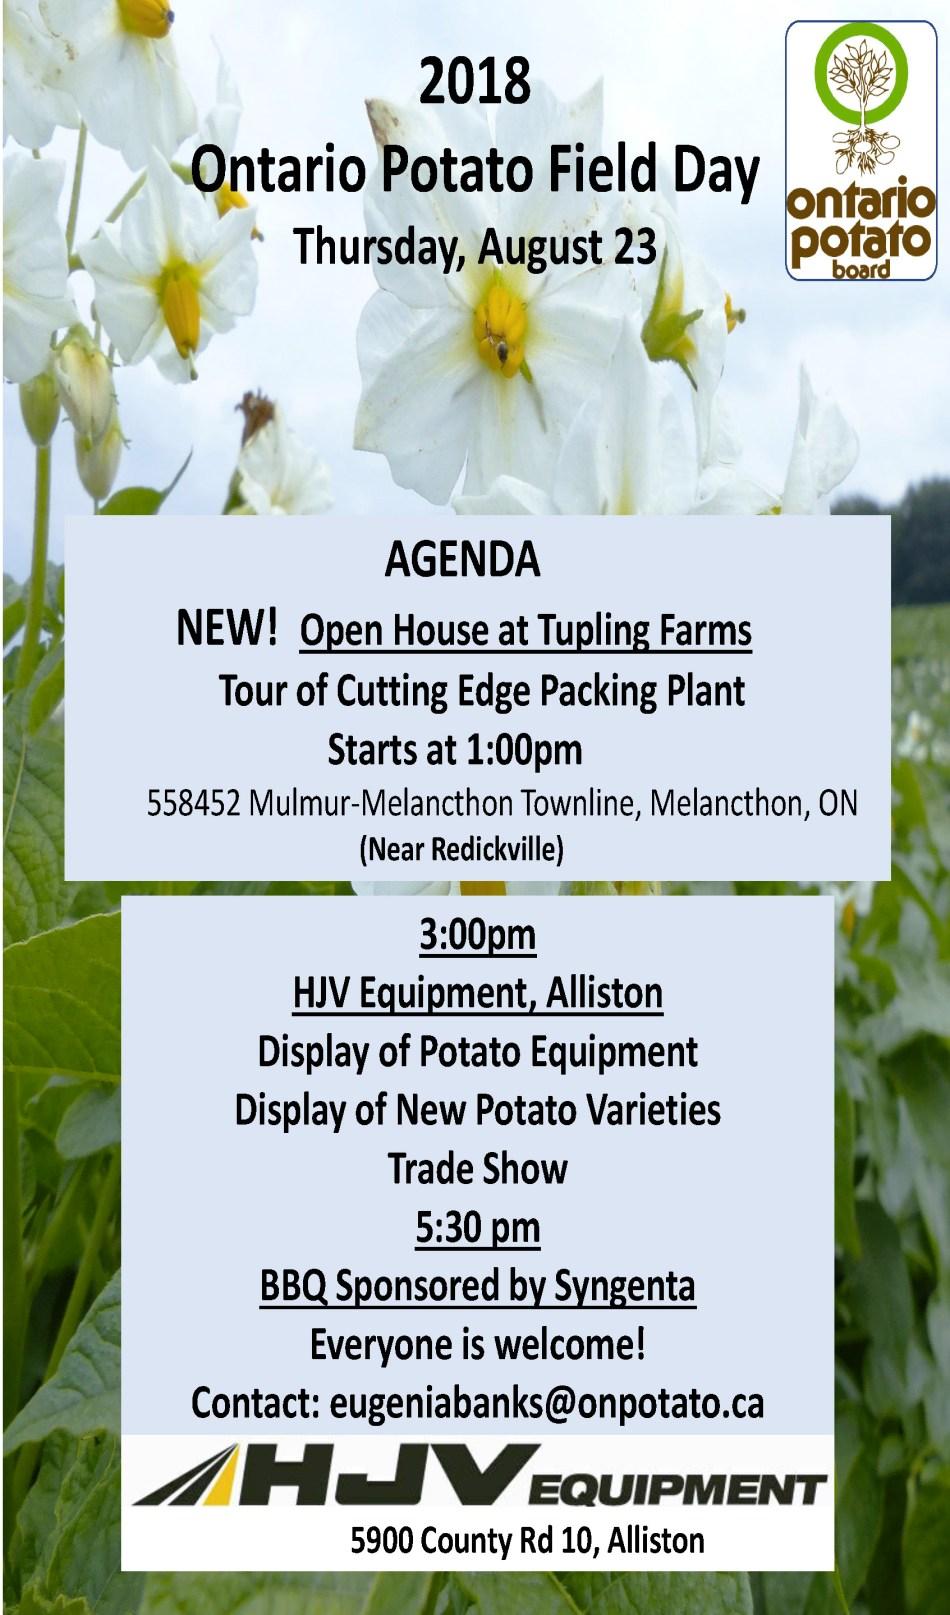 2018 Field Day Updated Agenda